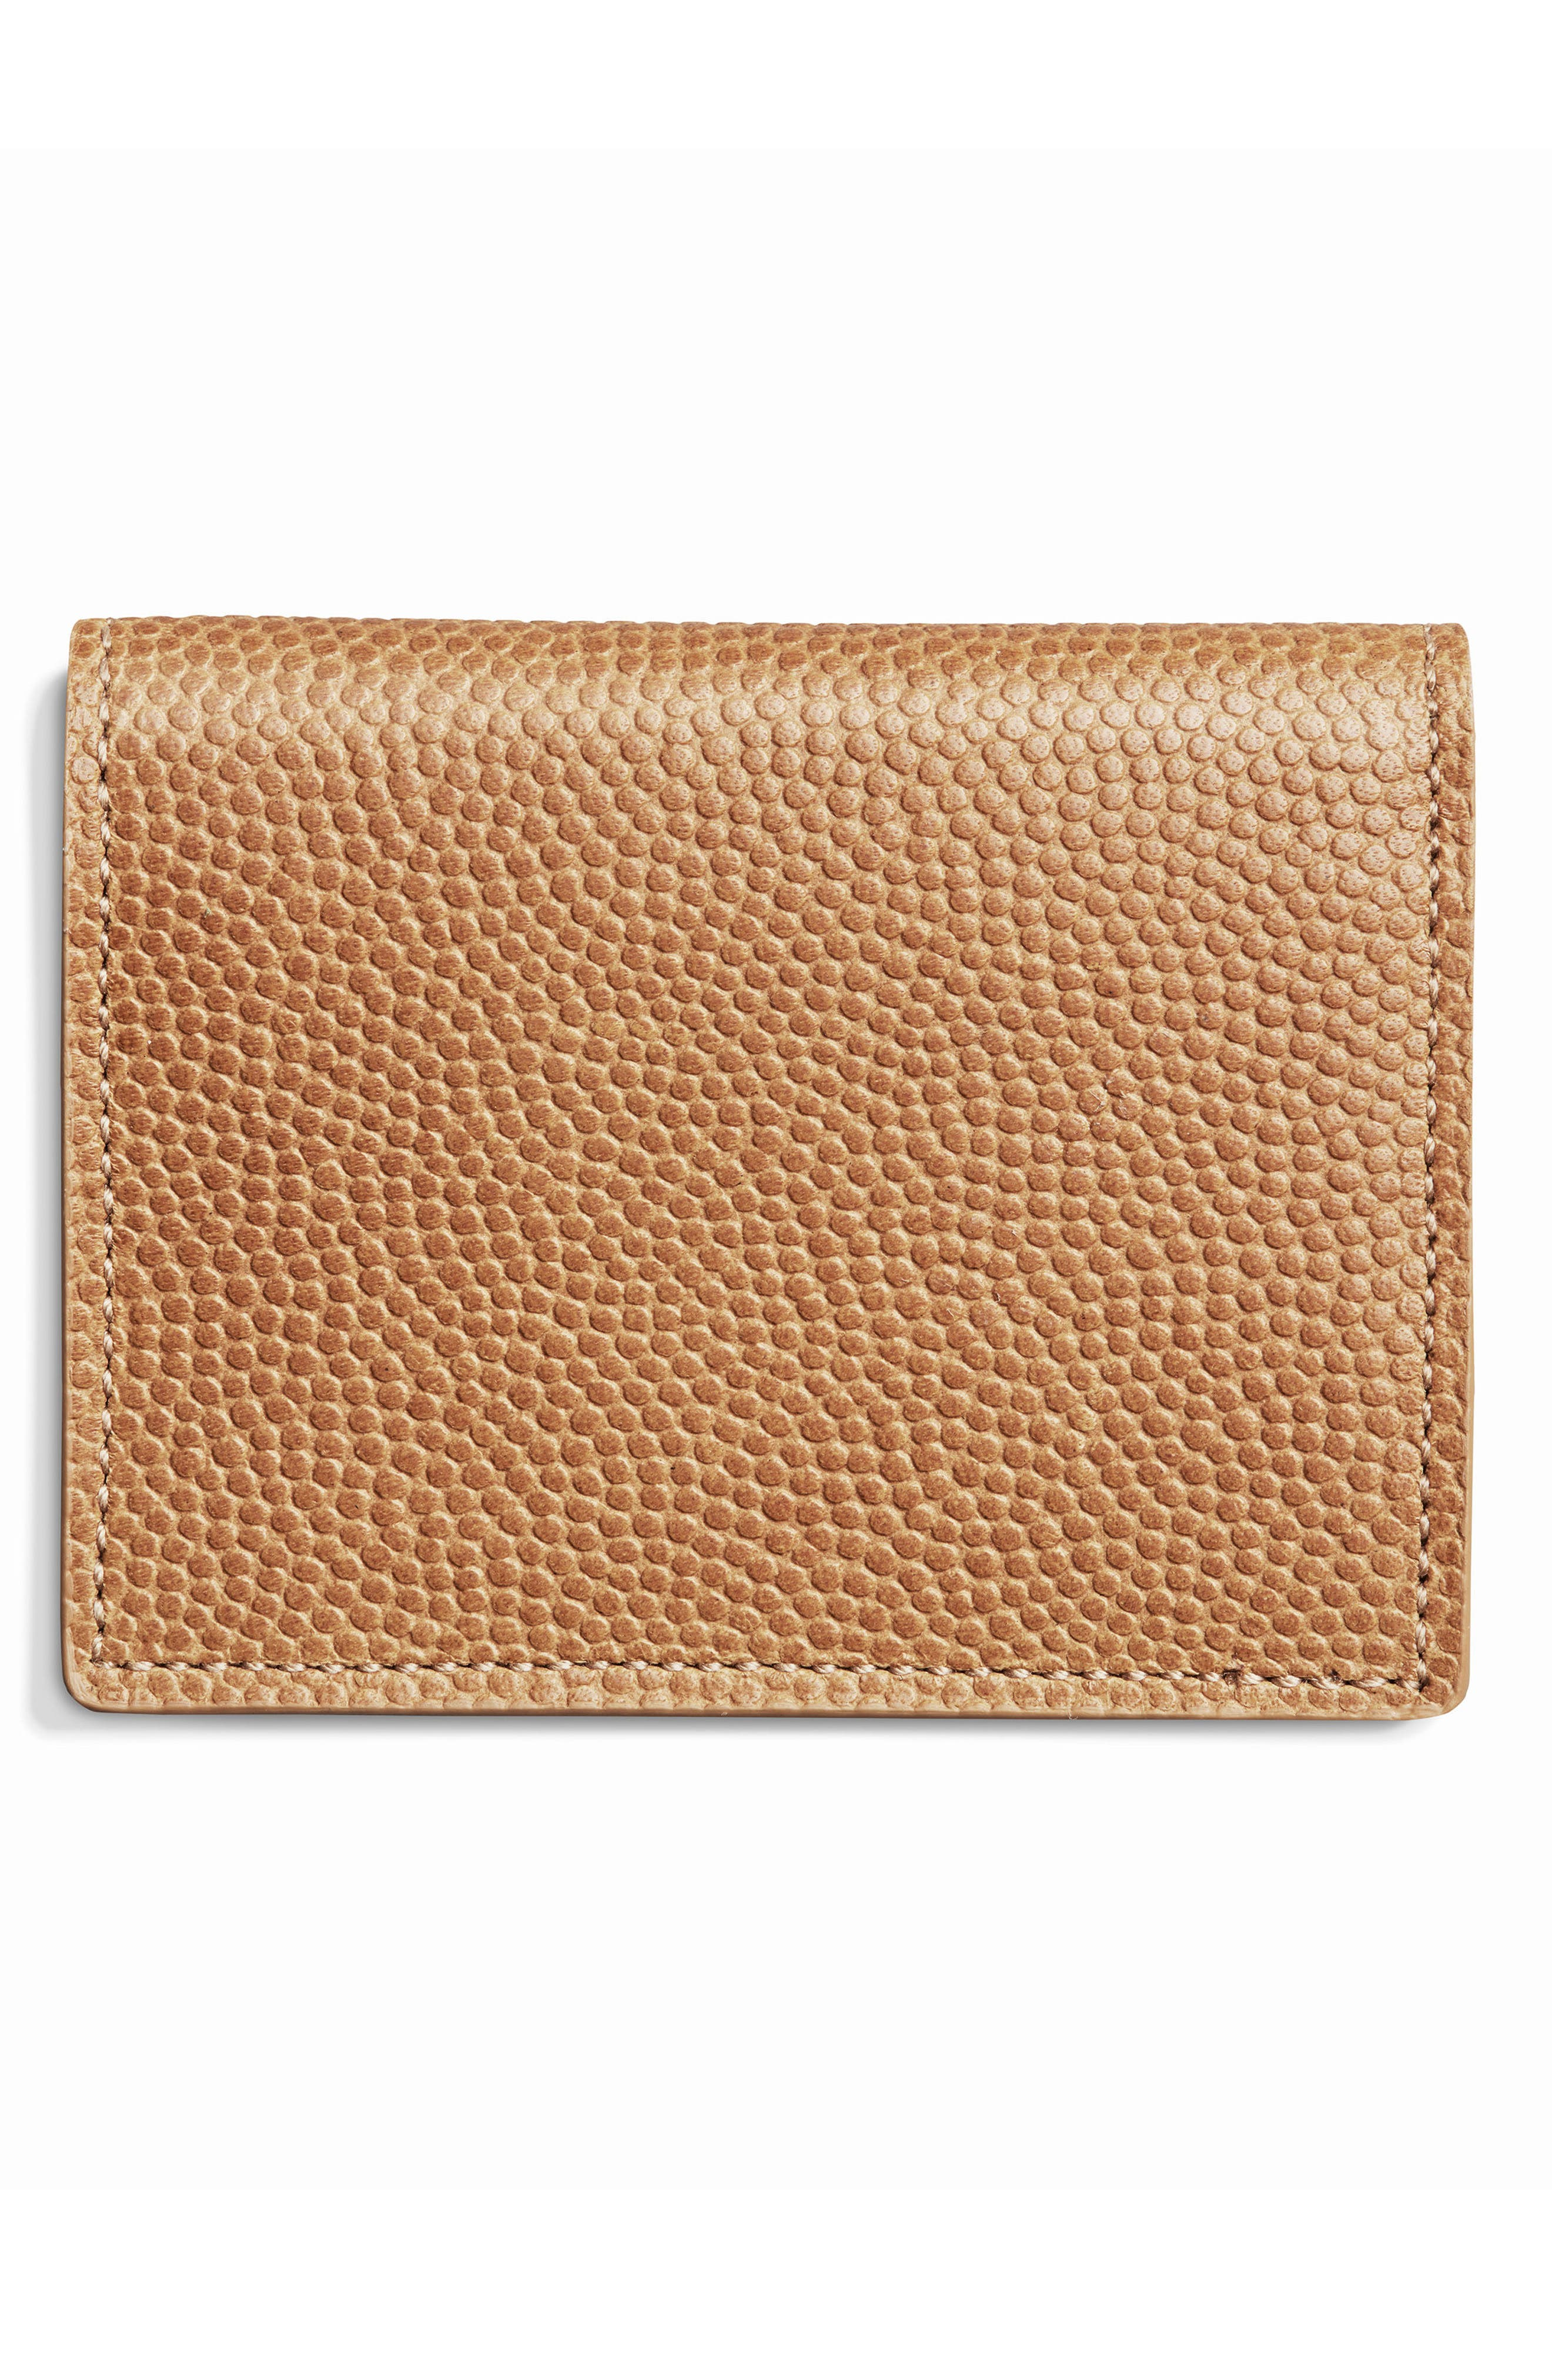 Leather Wallet,                             Alternate thumbnail 3, color,                             Camel